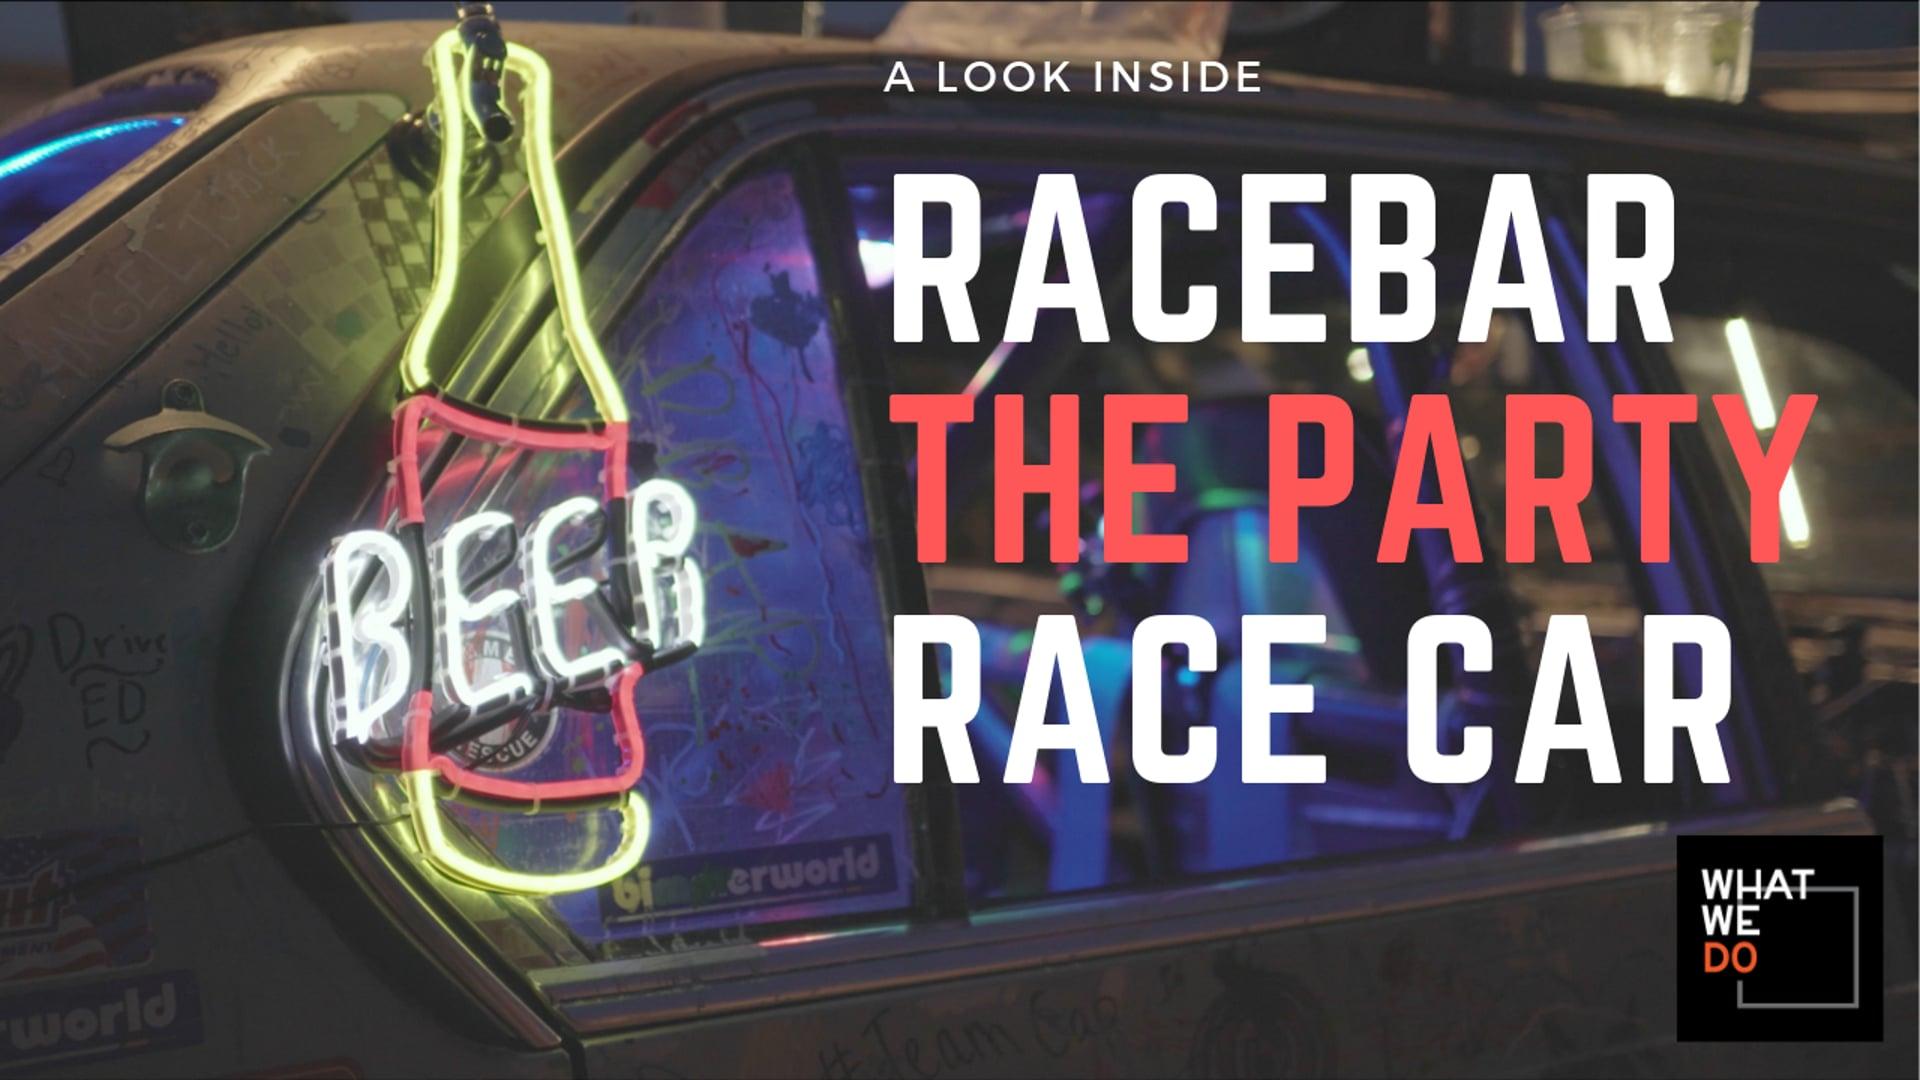 Racebar the Racecar (S1:E6 What We Do)